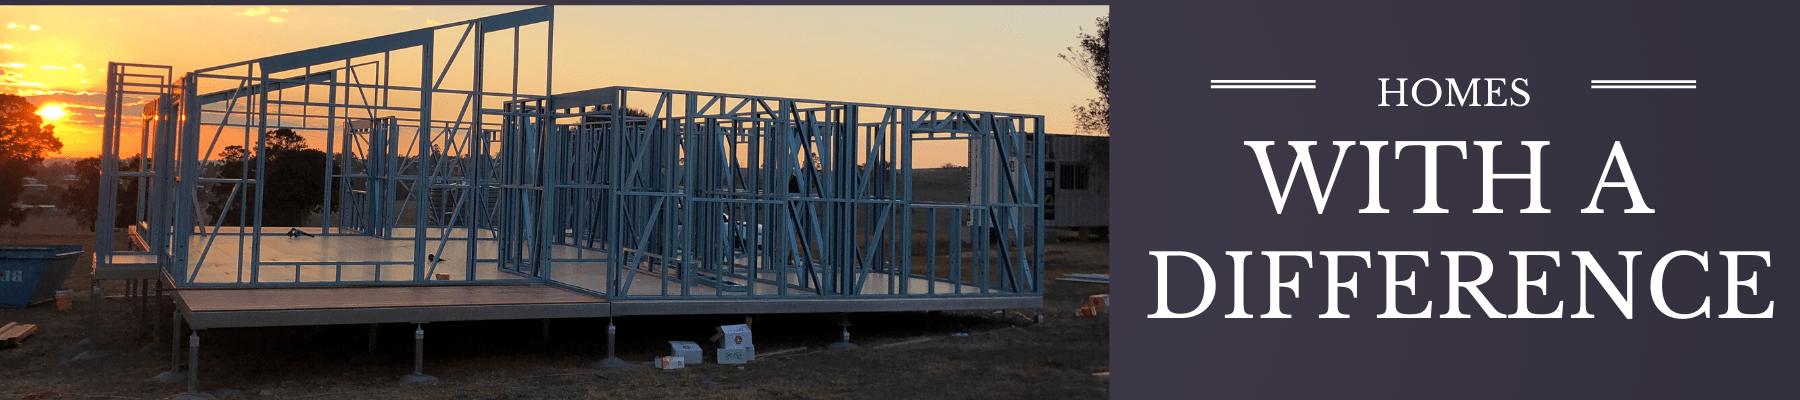 TJS Building - Learn More